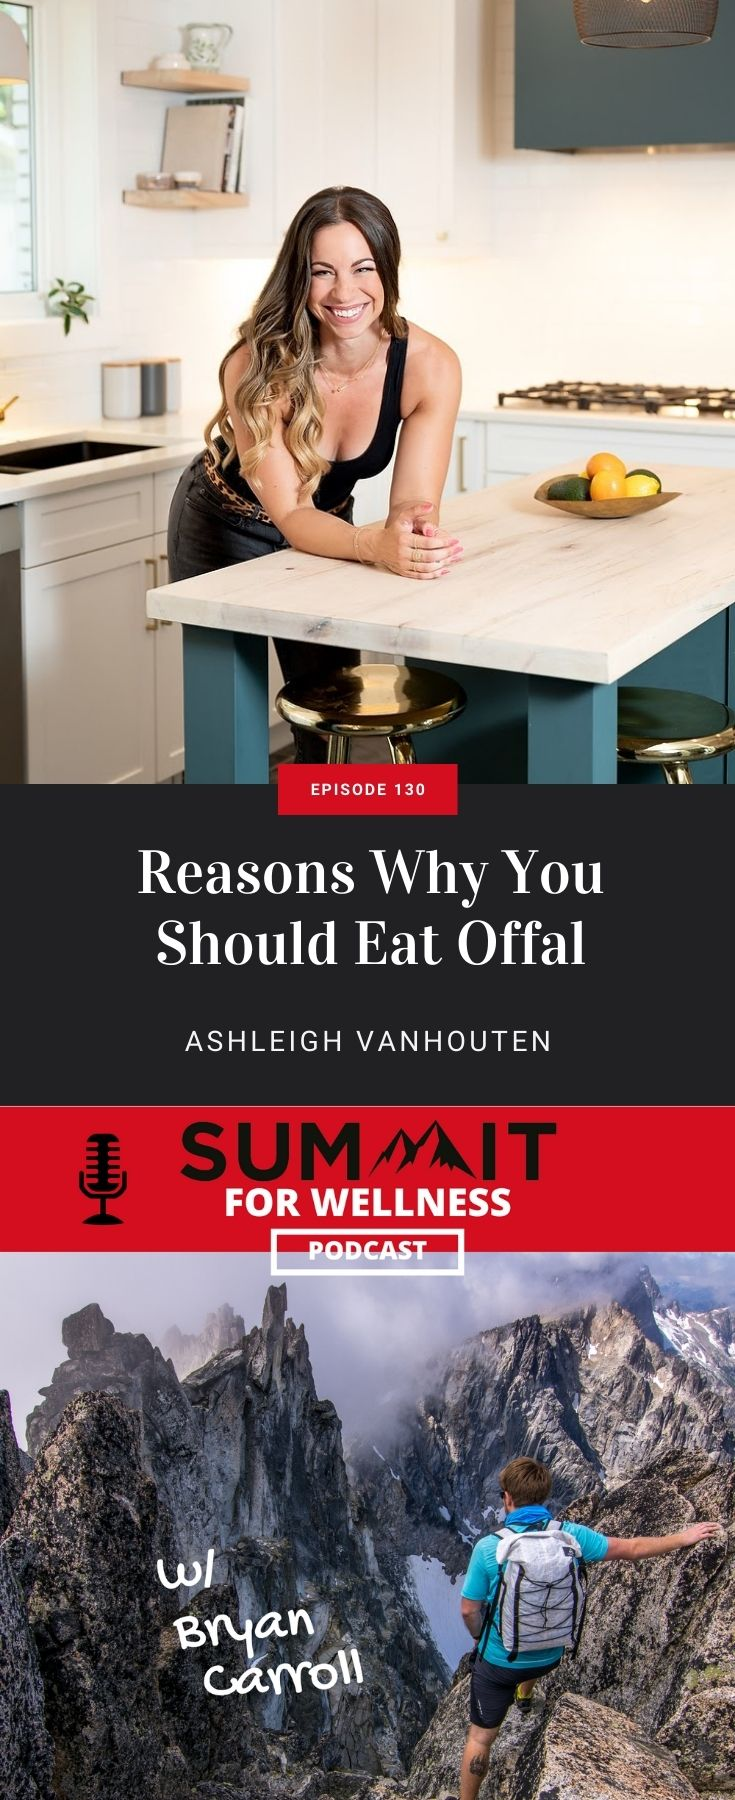 Ashleigh VanHouten shares different ways to eat offal